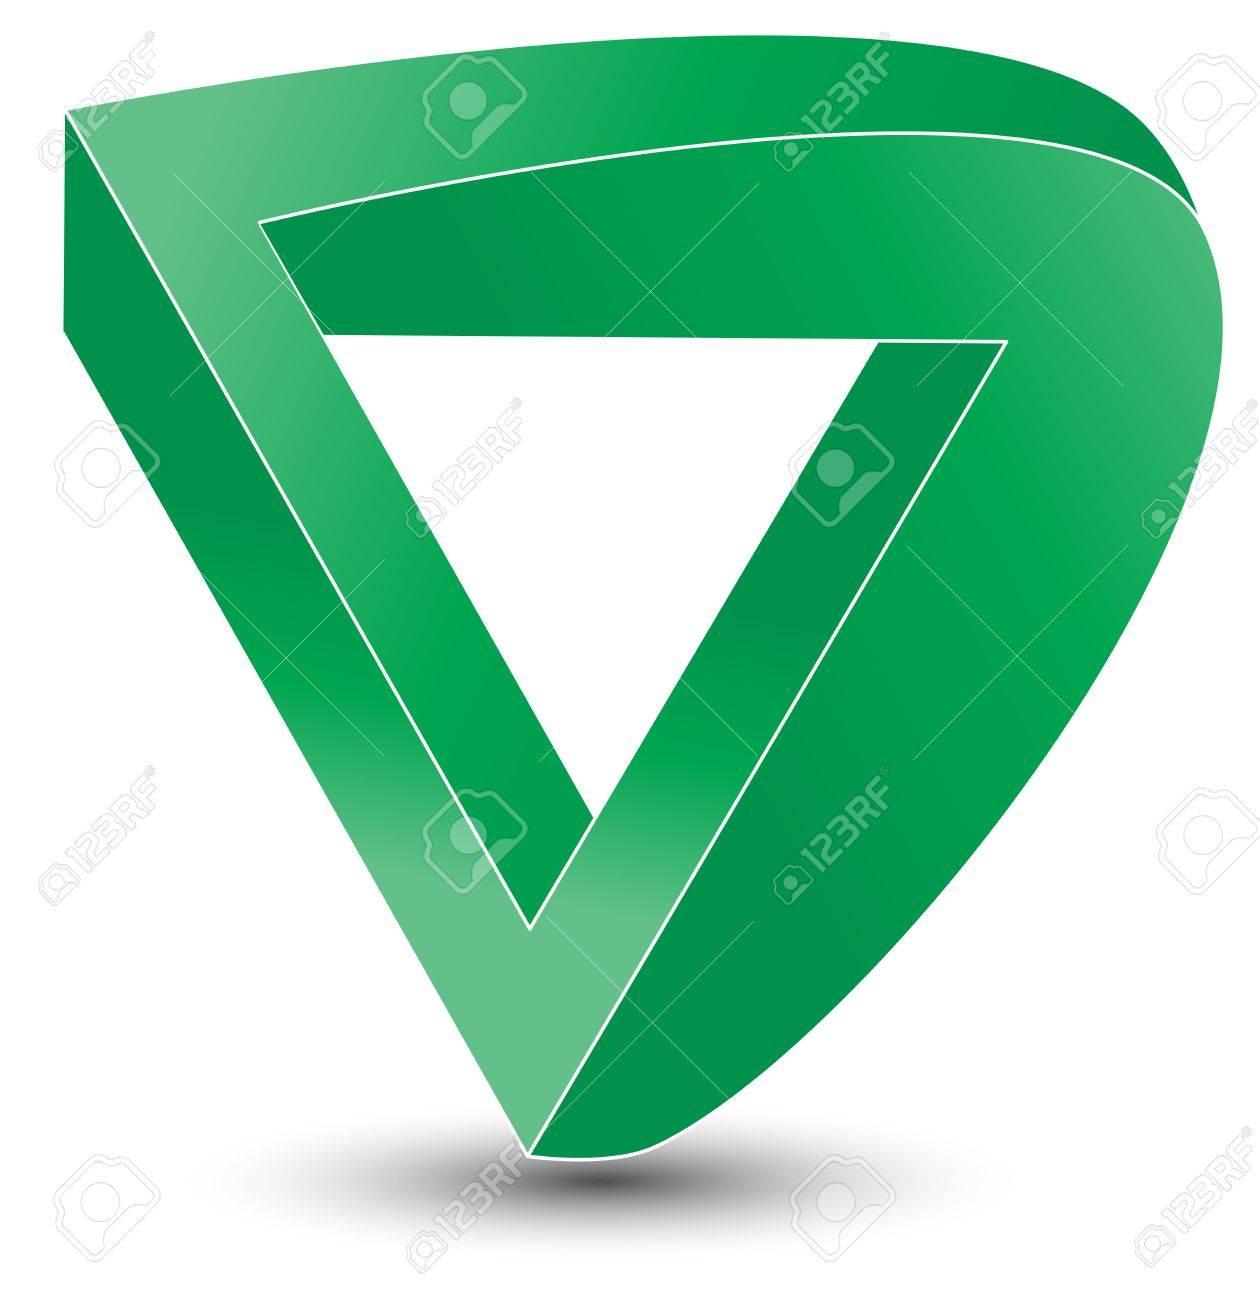 triangle Stock Vector - 17461772